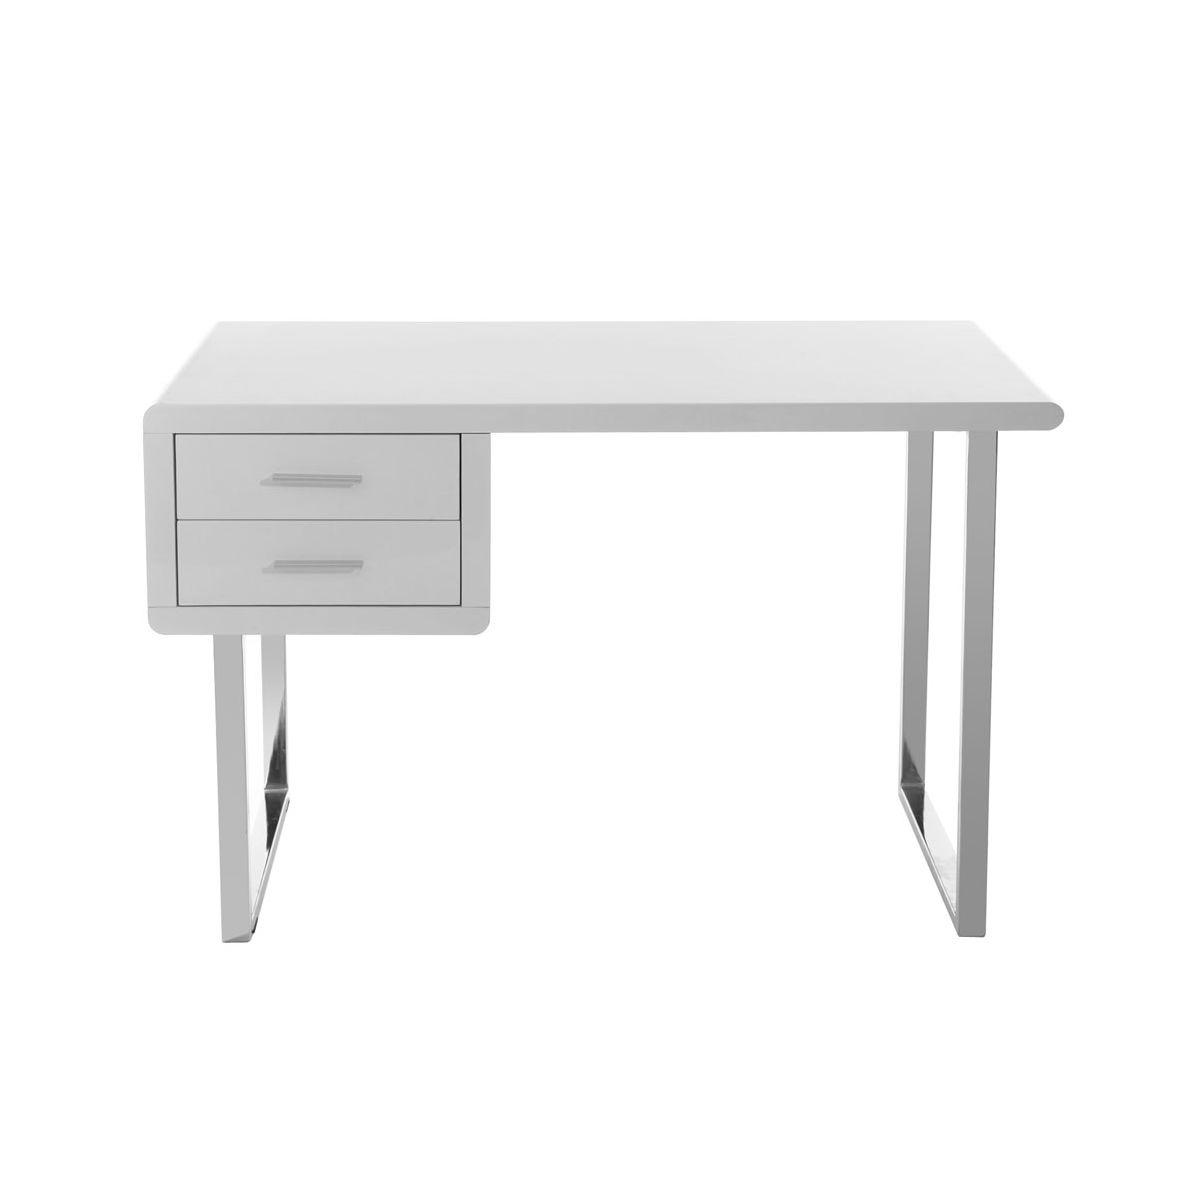 bureau design blanc laque roxi guten morgwen. Black Bedroom Furniture Sets. Home Design Ideas